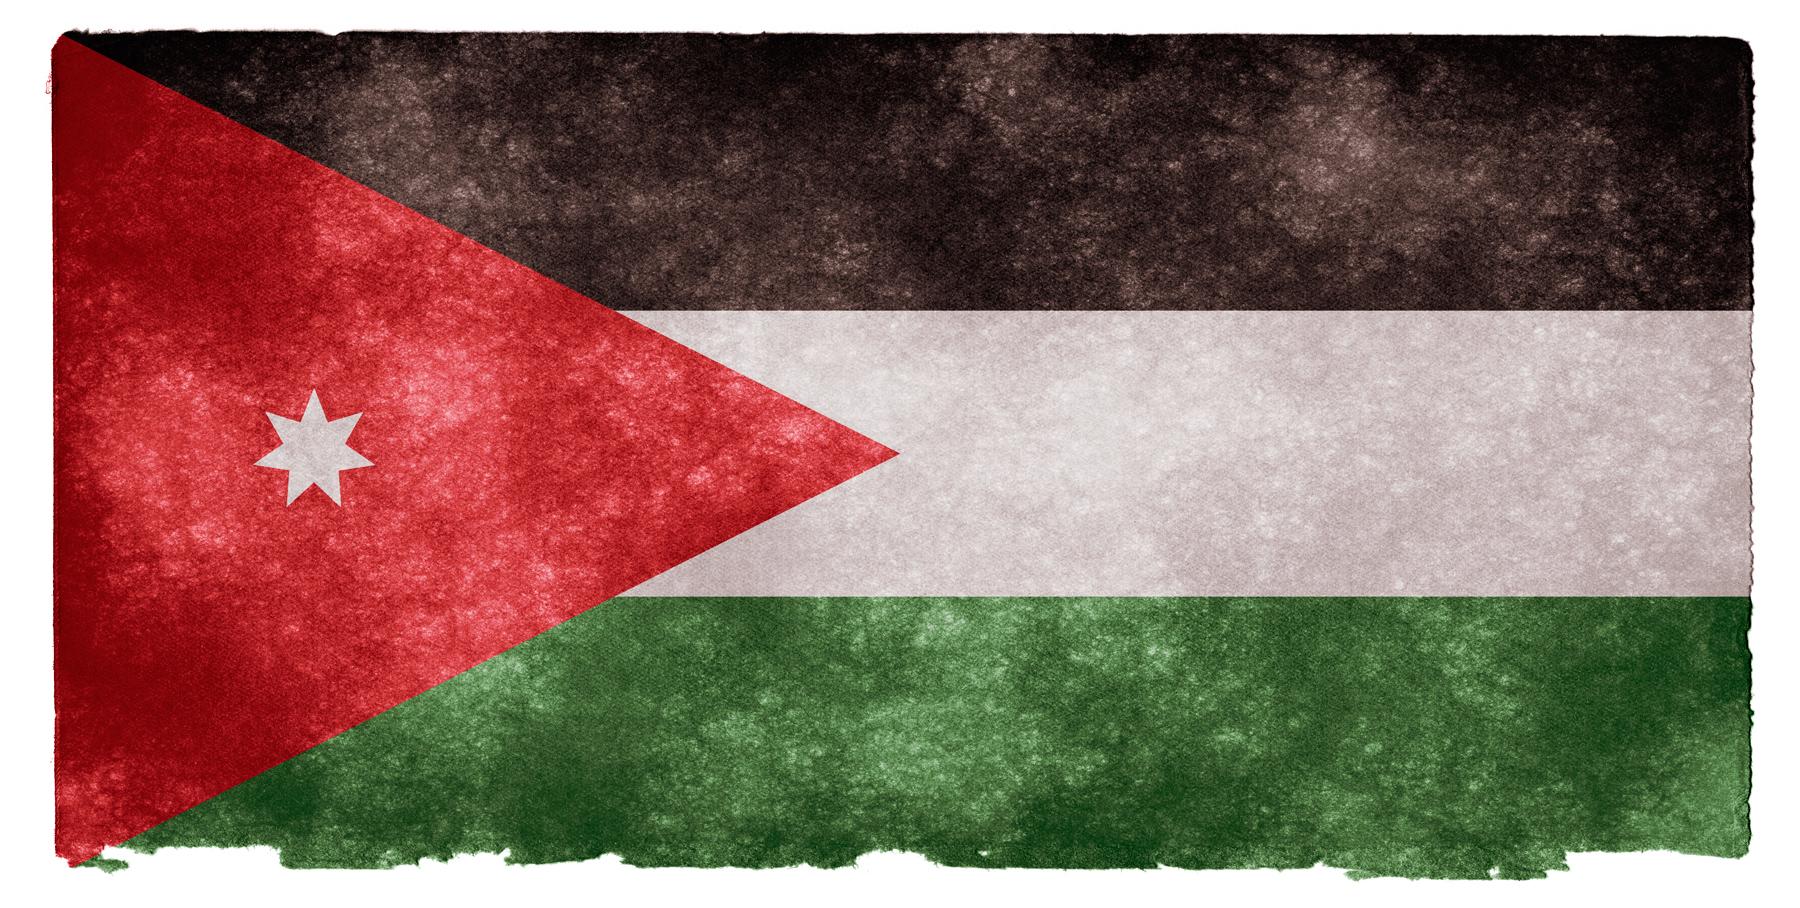 Jordan Grunge Flag, Aged, Red, Middle-east, Middle-eastern, HQ Photo